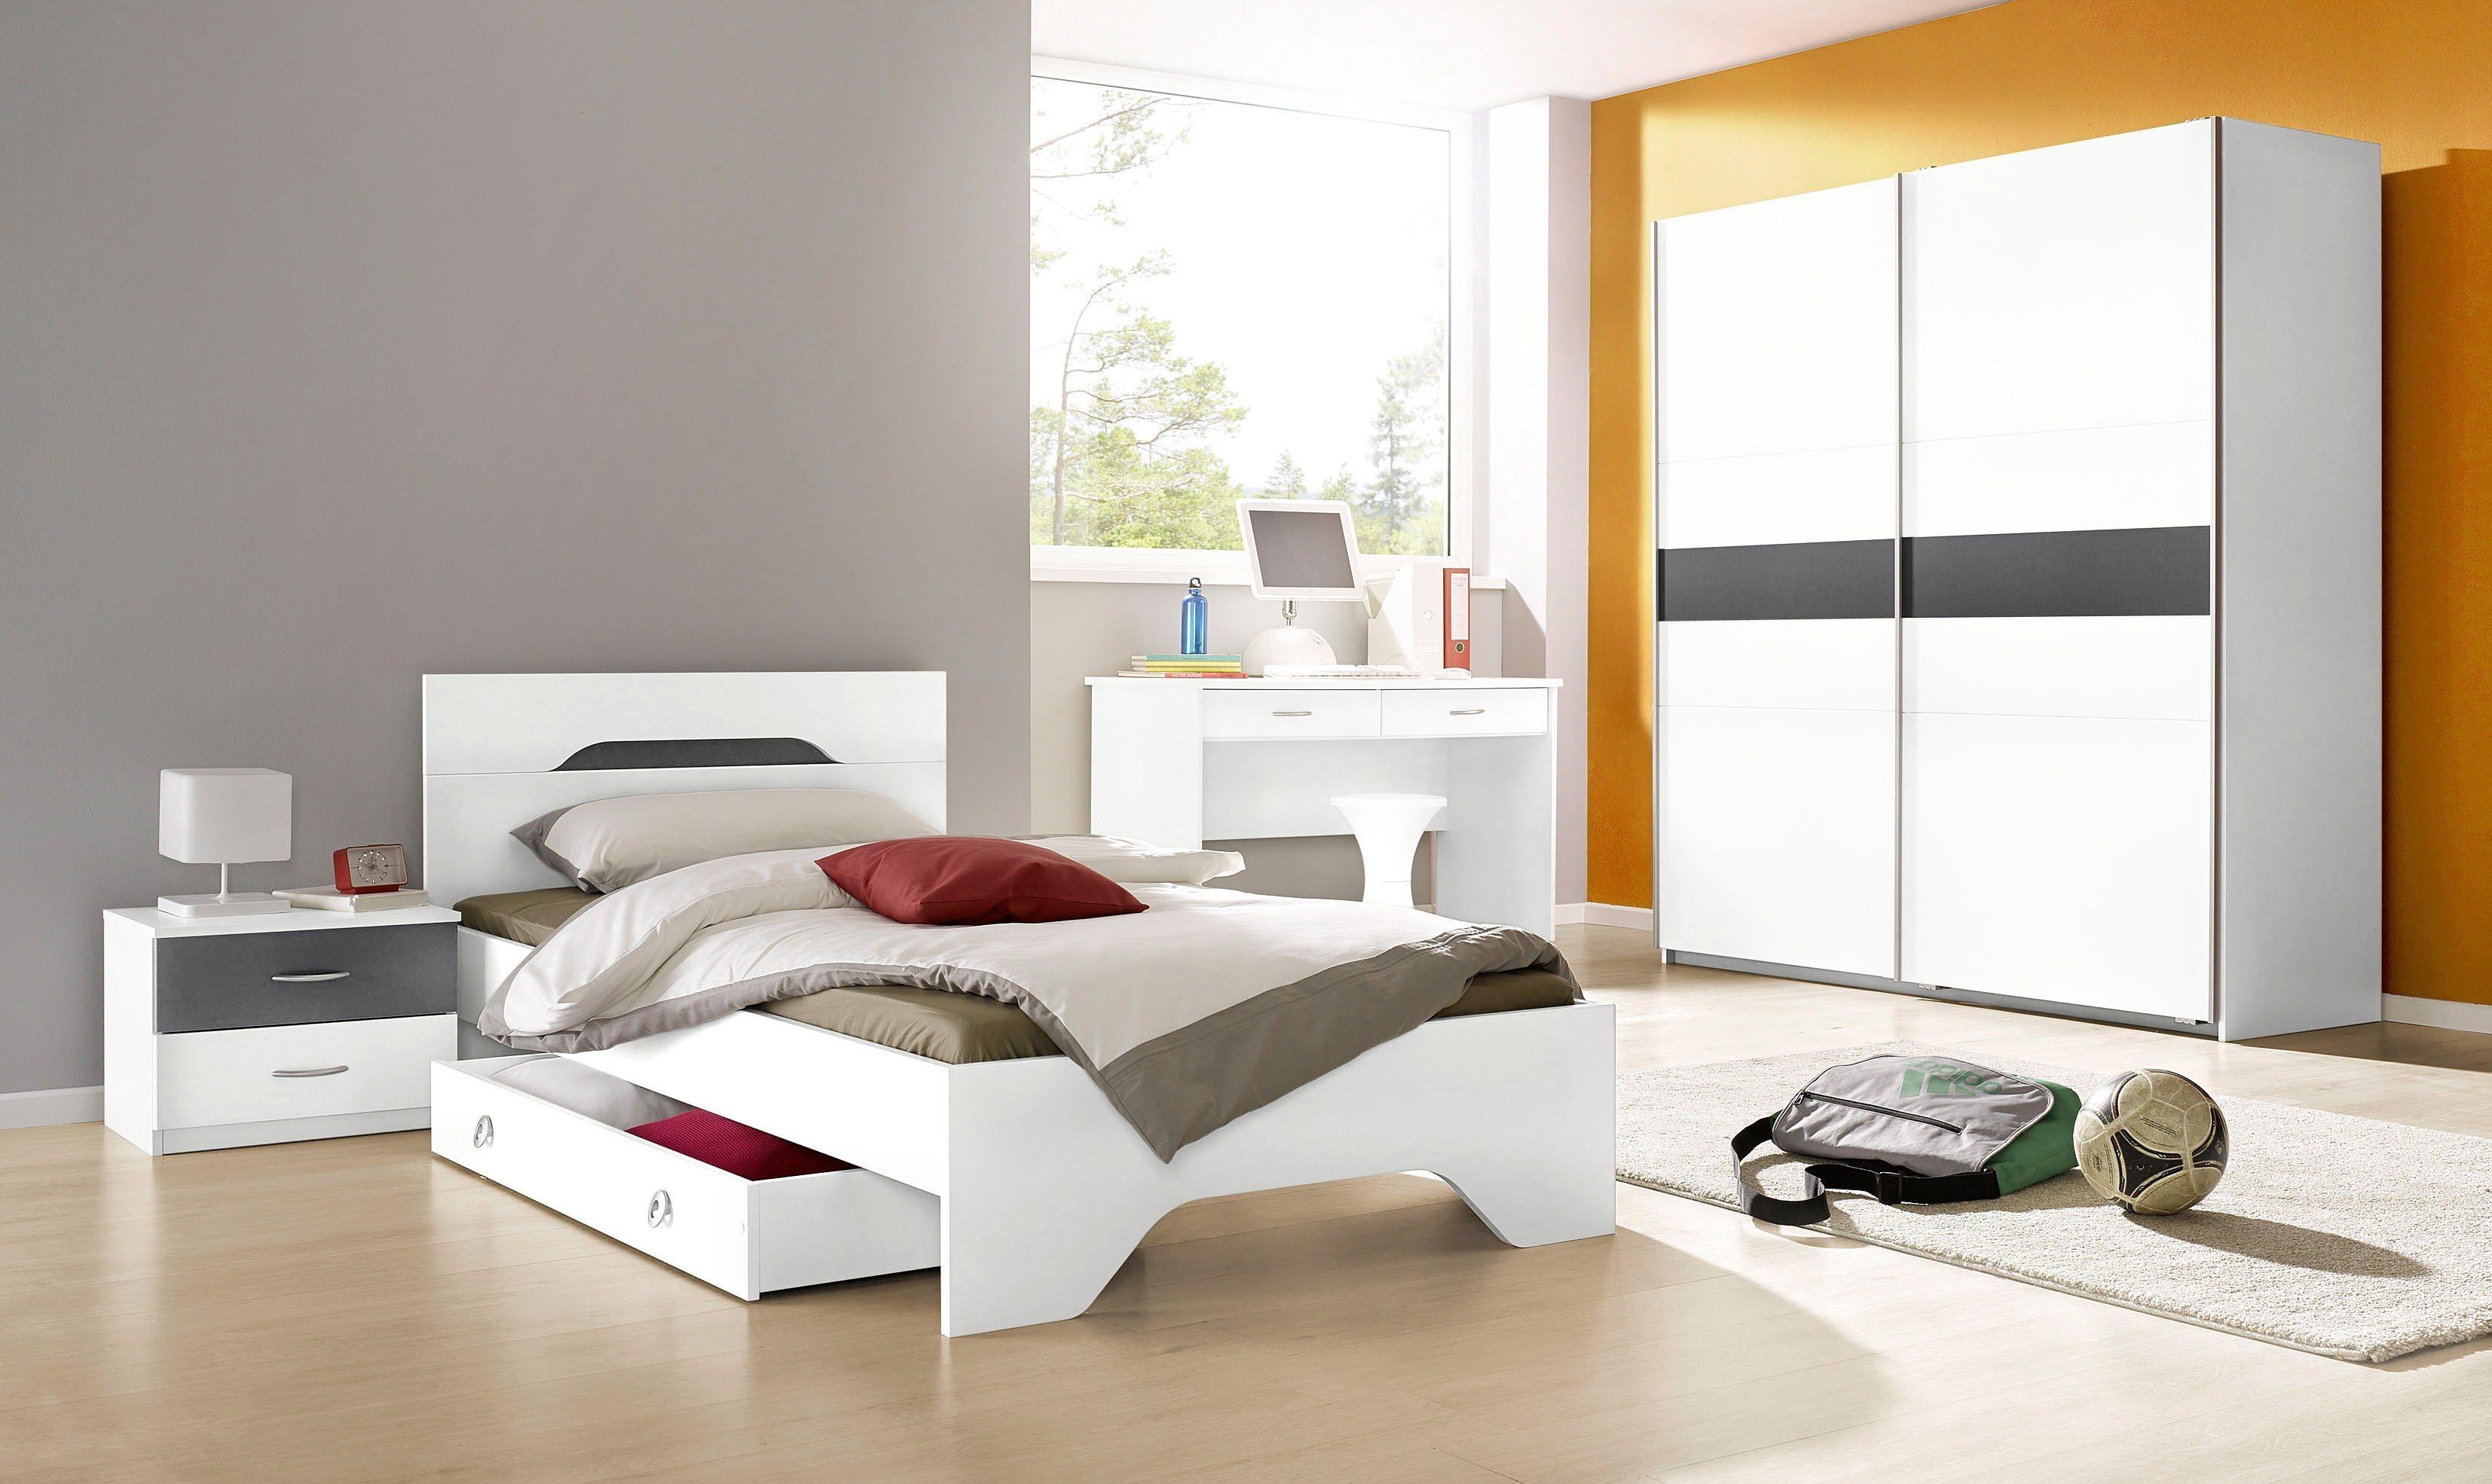 rauch PACK`S Futonbett | Schlafzimmer > Betten > Futonbetten | rauch